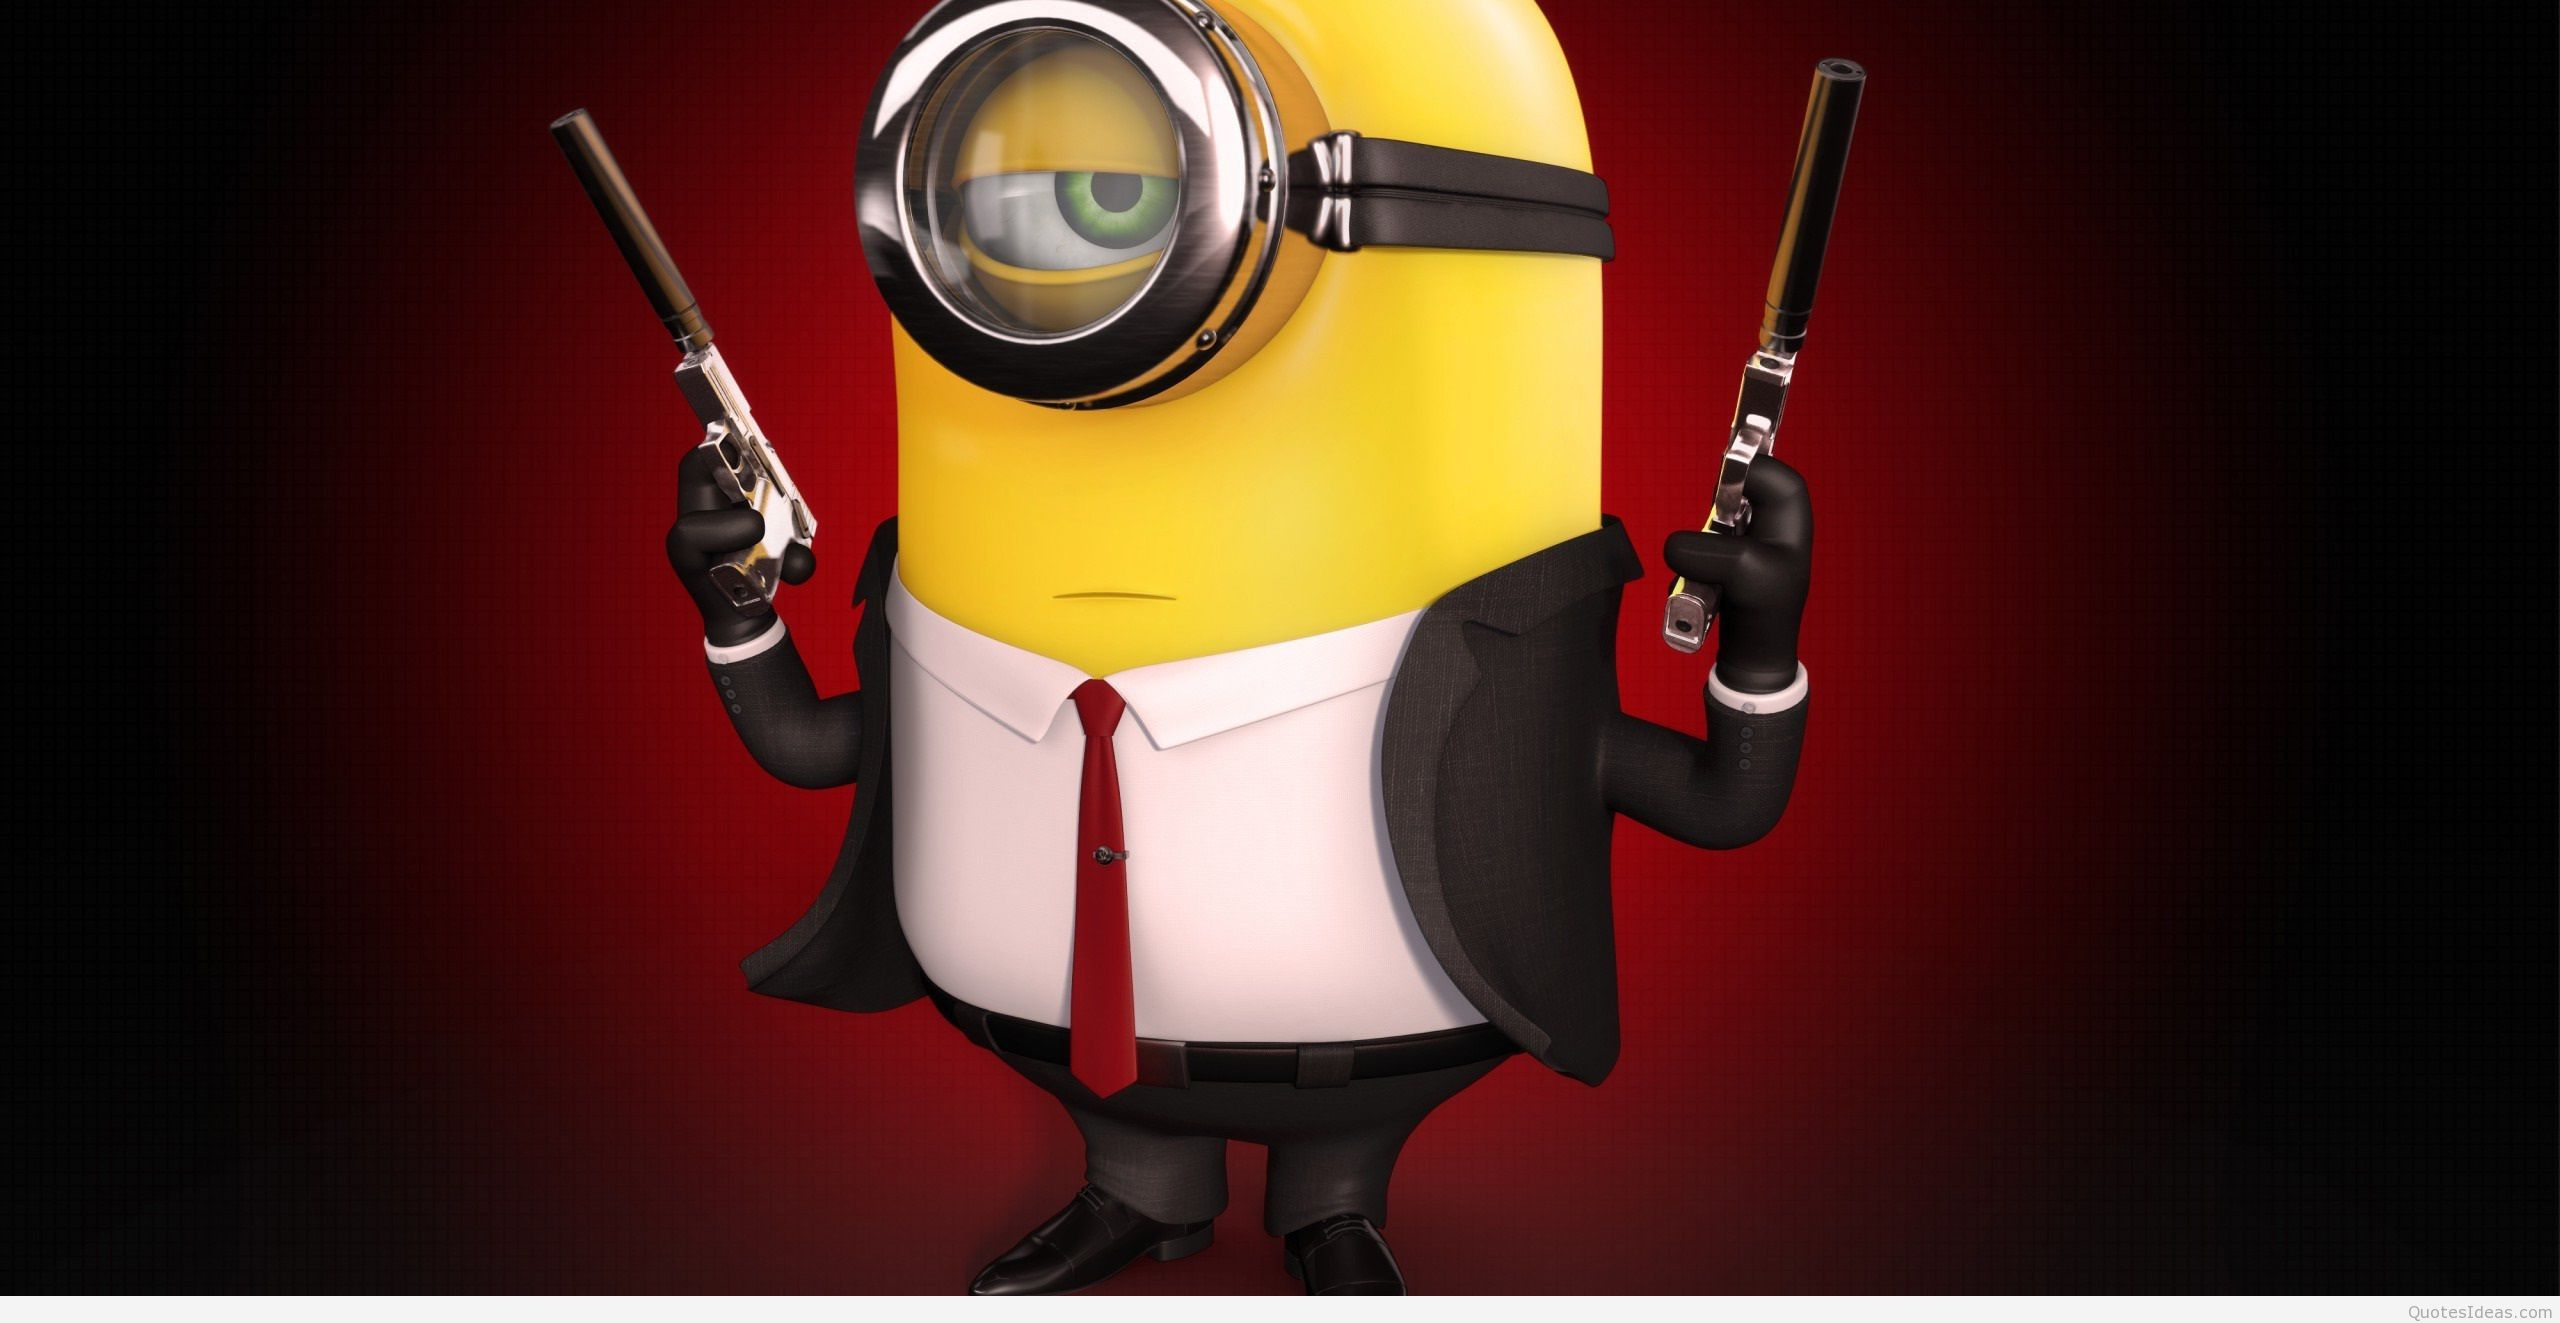 Hitman Minion Wallpaper Funny Movie Photo Wallpaperjpg 2560x1323